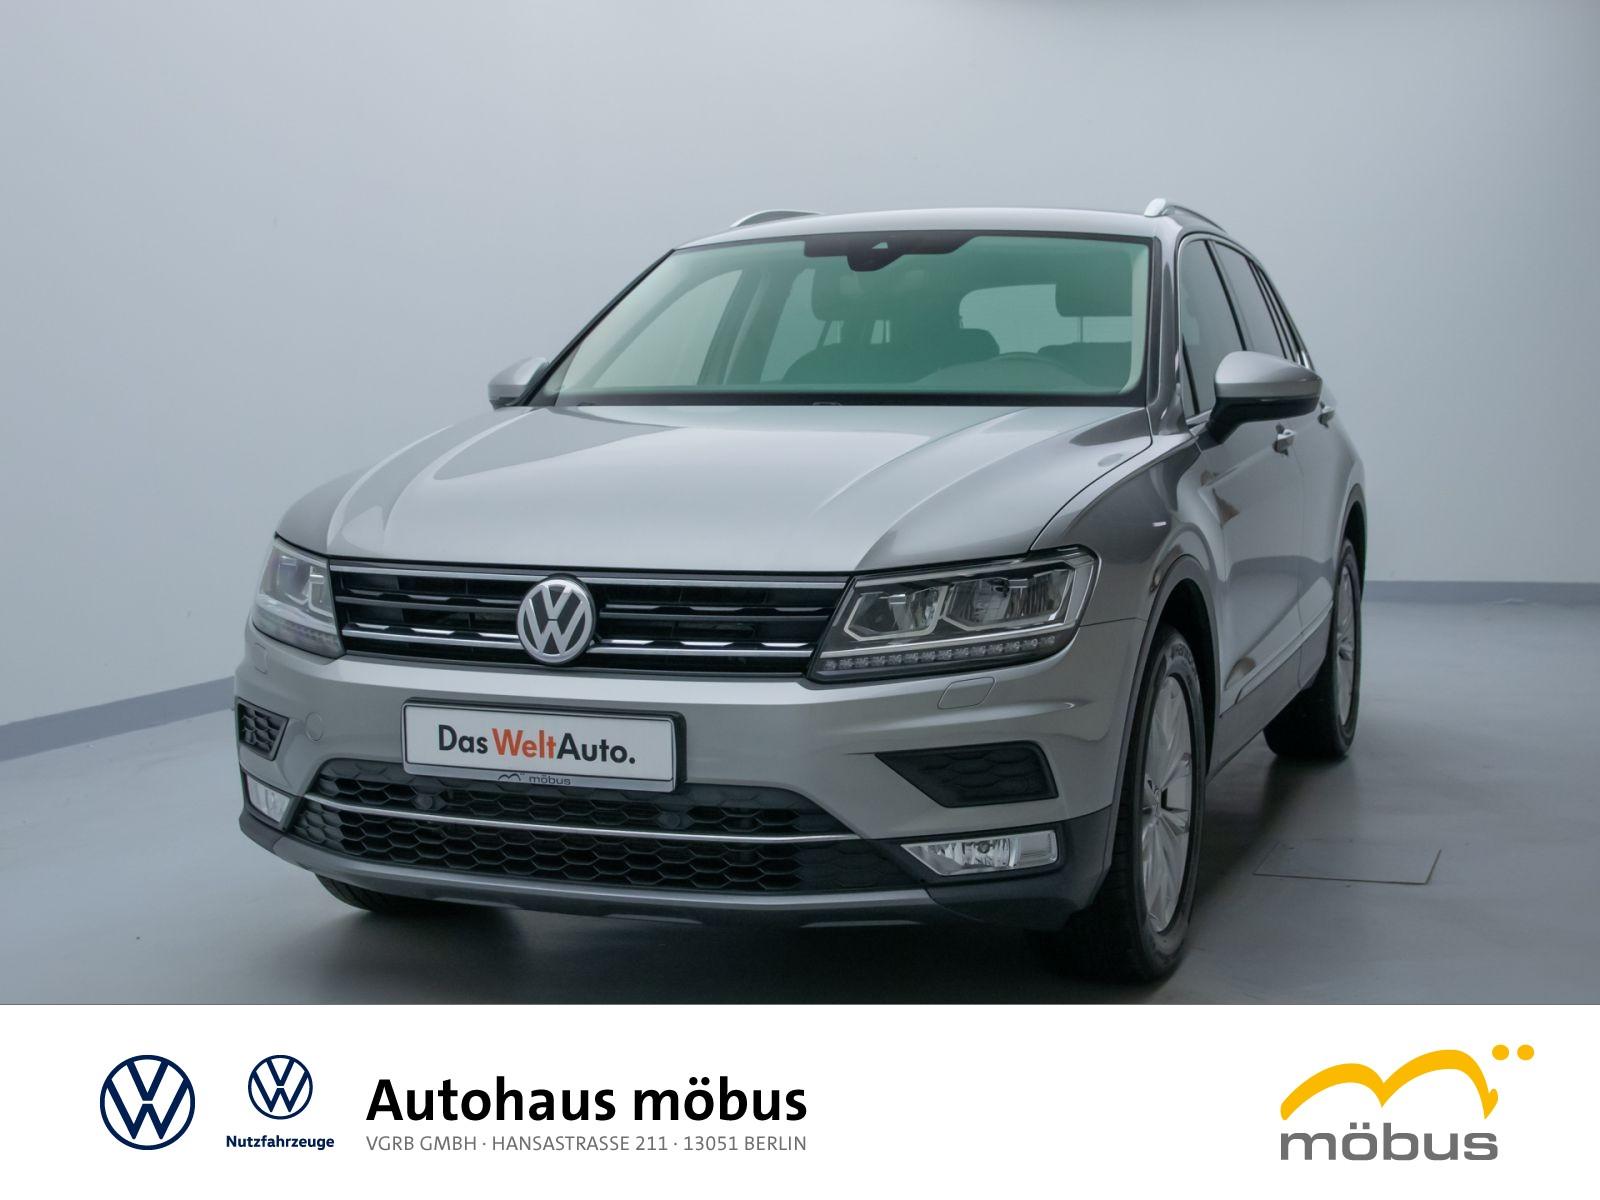 Volkswagen TIGUAN 2.0 TDI DSG HIGHL 4MOTION*AHK*NAVI*ASSIST*AID*APP*LED*USB, Jahr 2017, Diesel